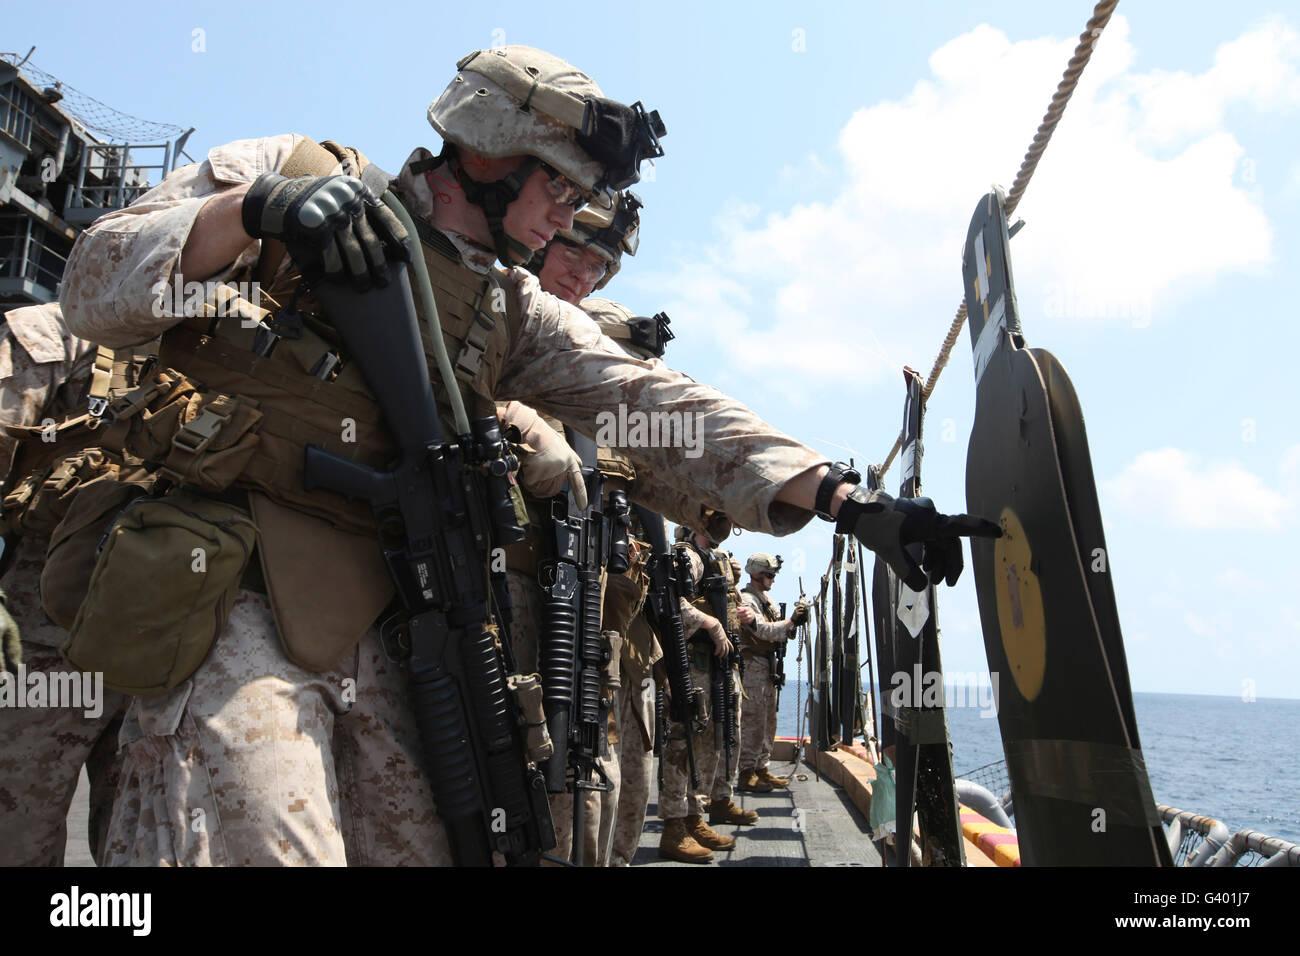 U.S. Marine looks over his target during a combat marksmanship program. -  Stock Image